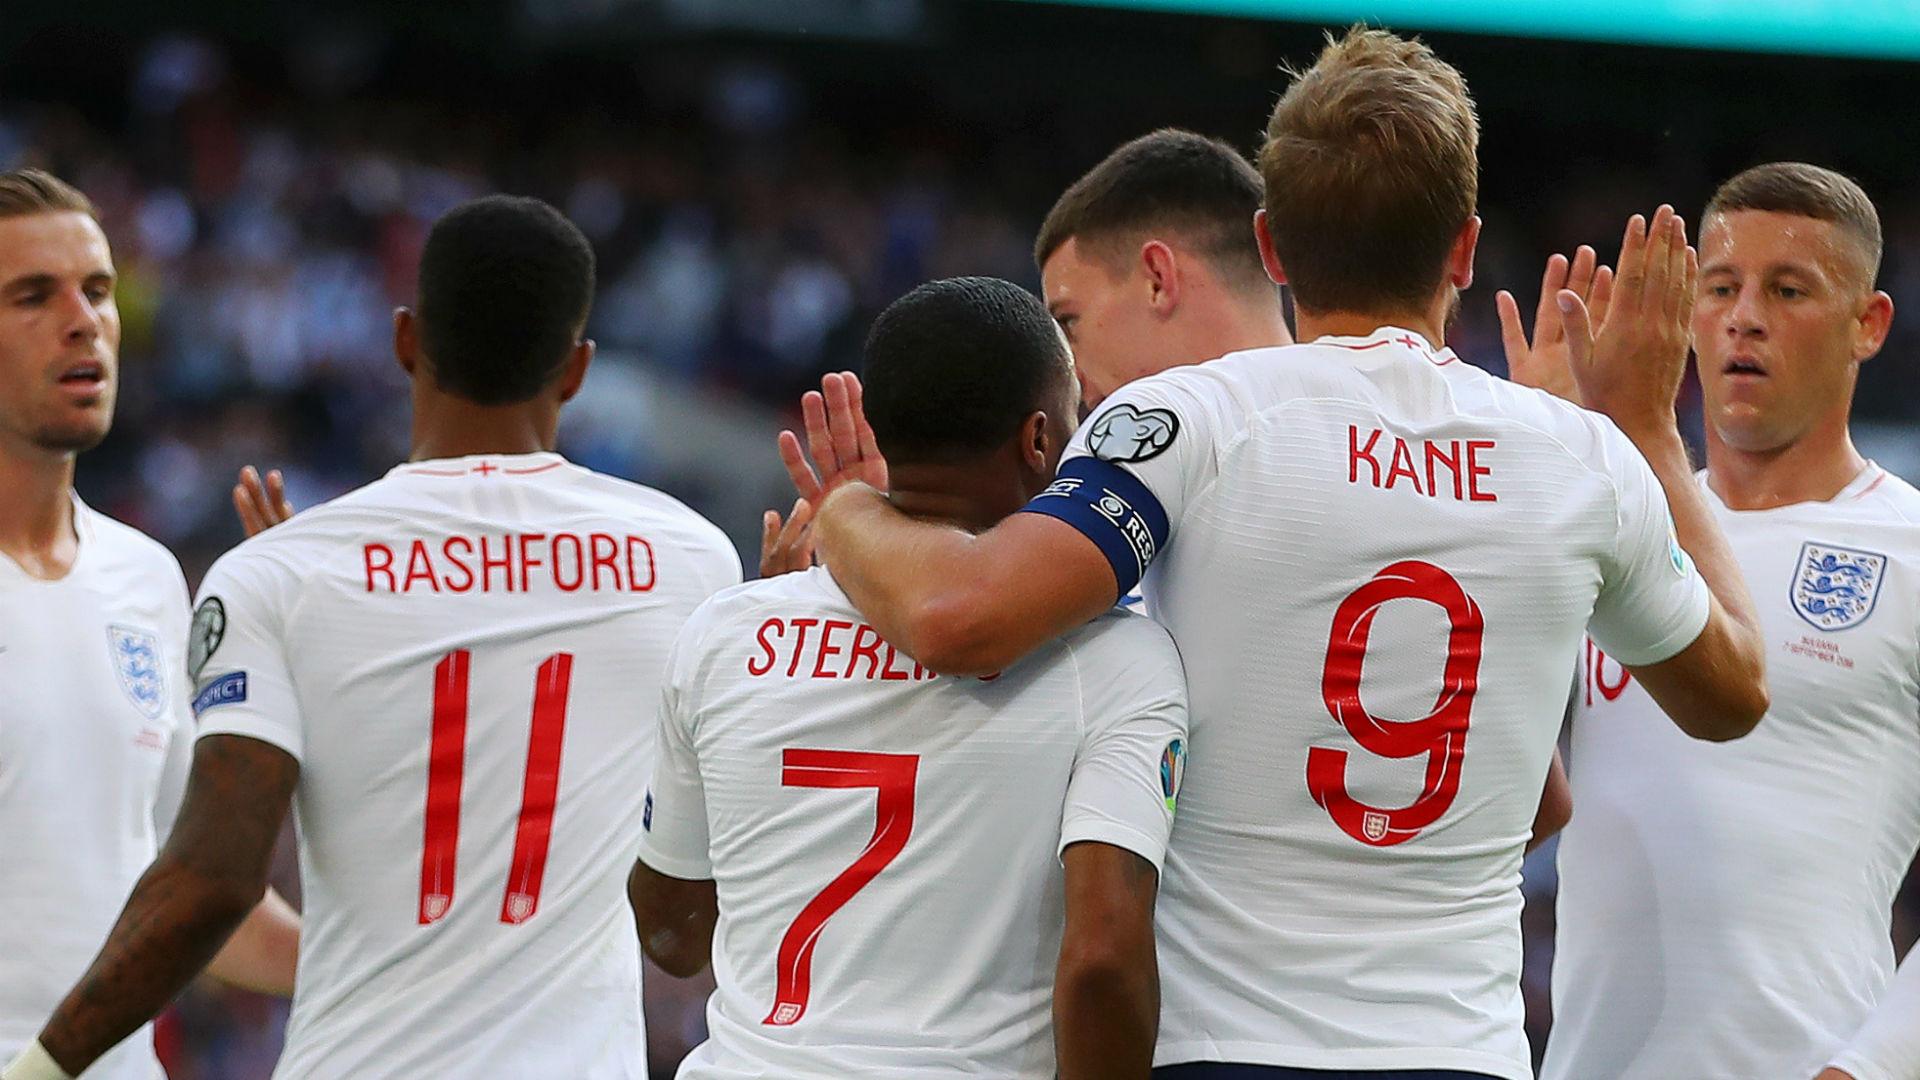 'England boast Europe's best front three' – Ronaldo, Griezmann & Co upstaged, says Sutton